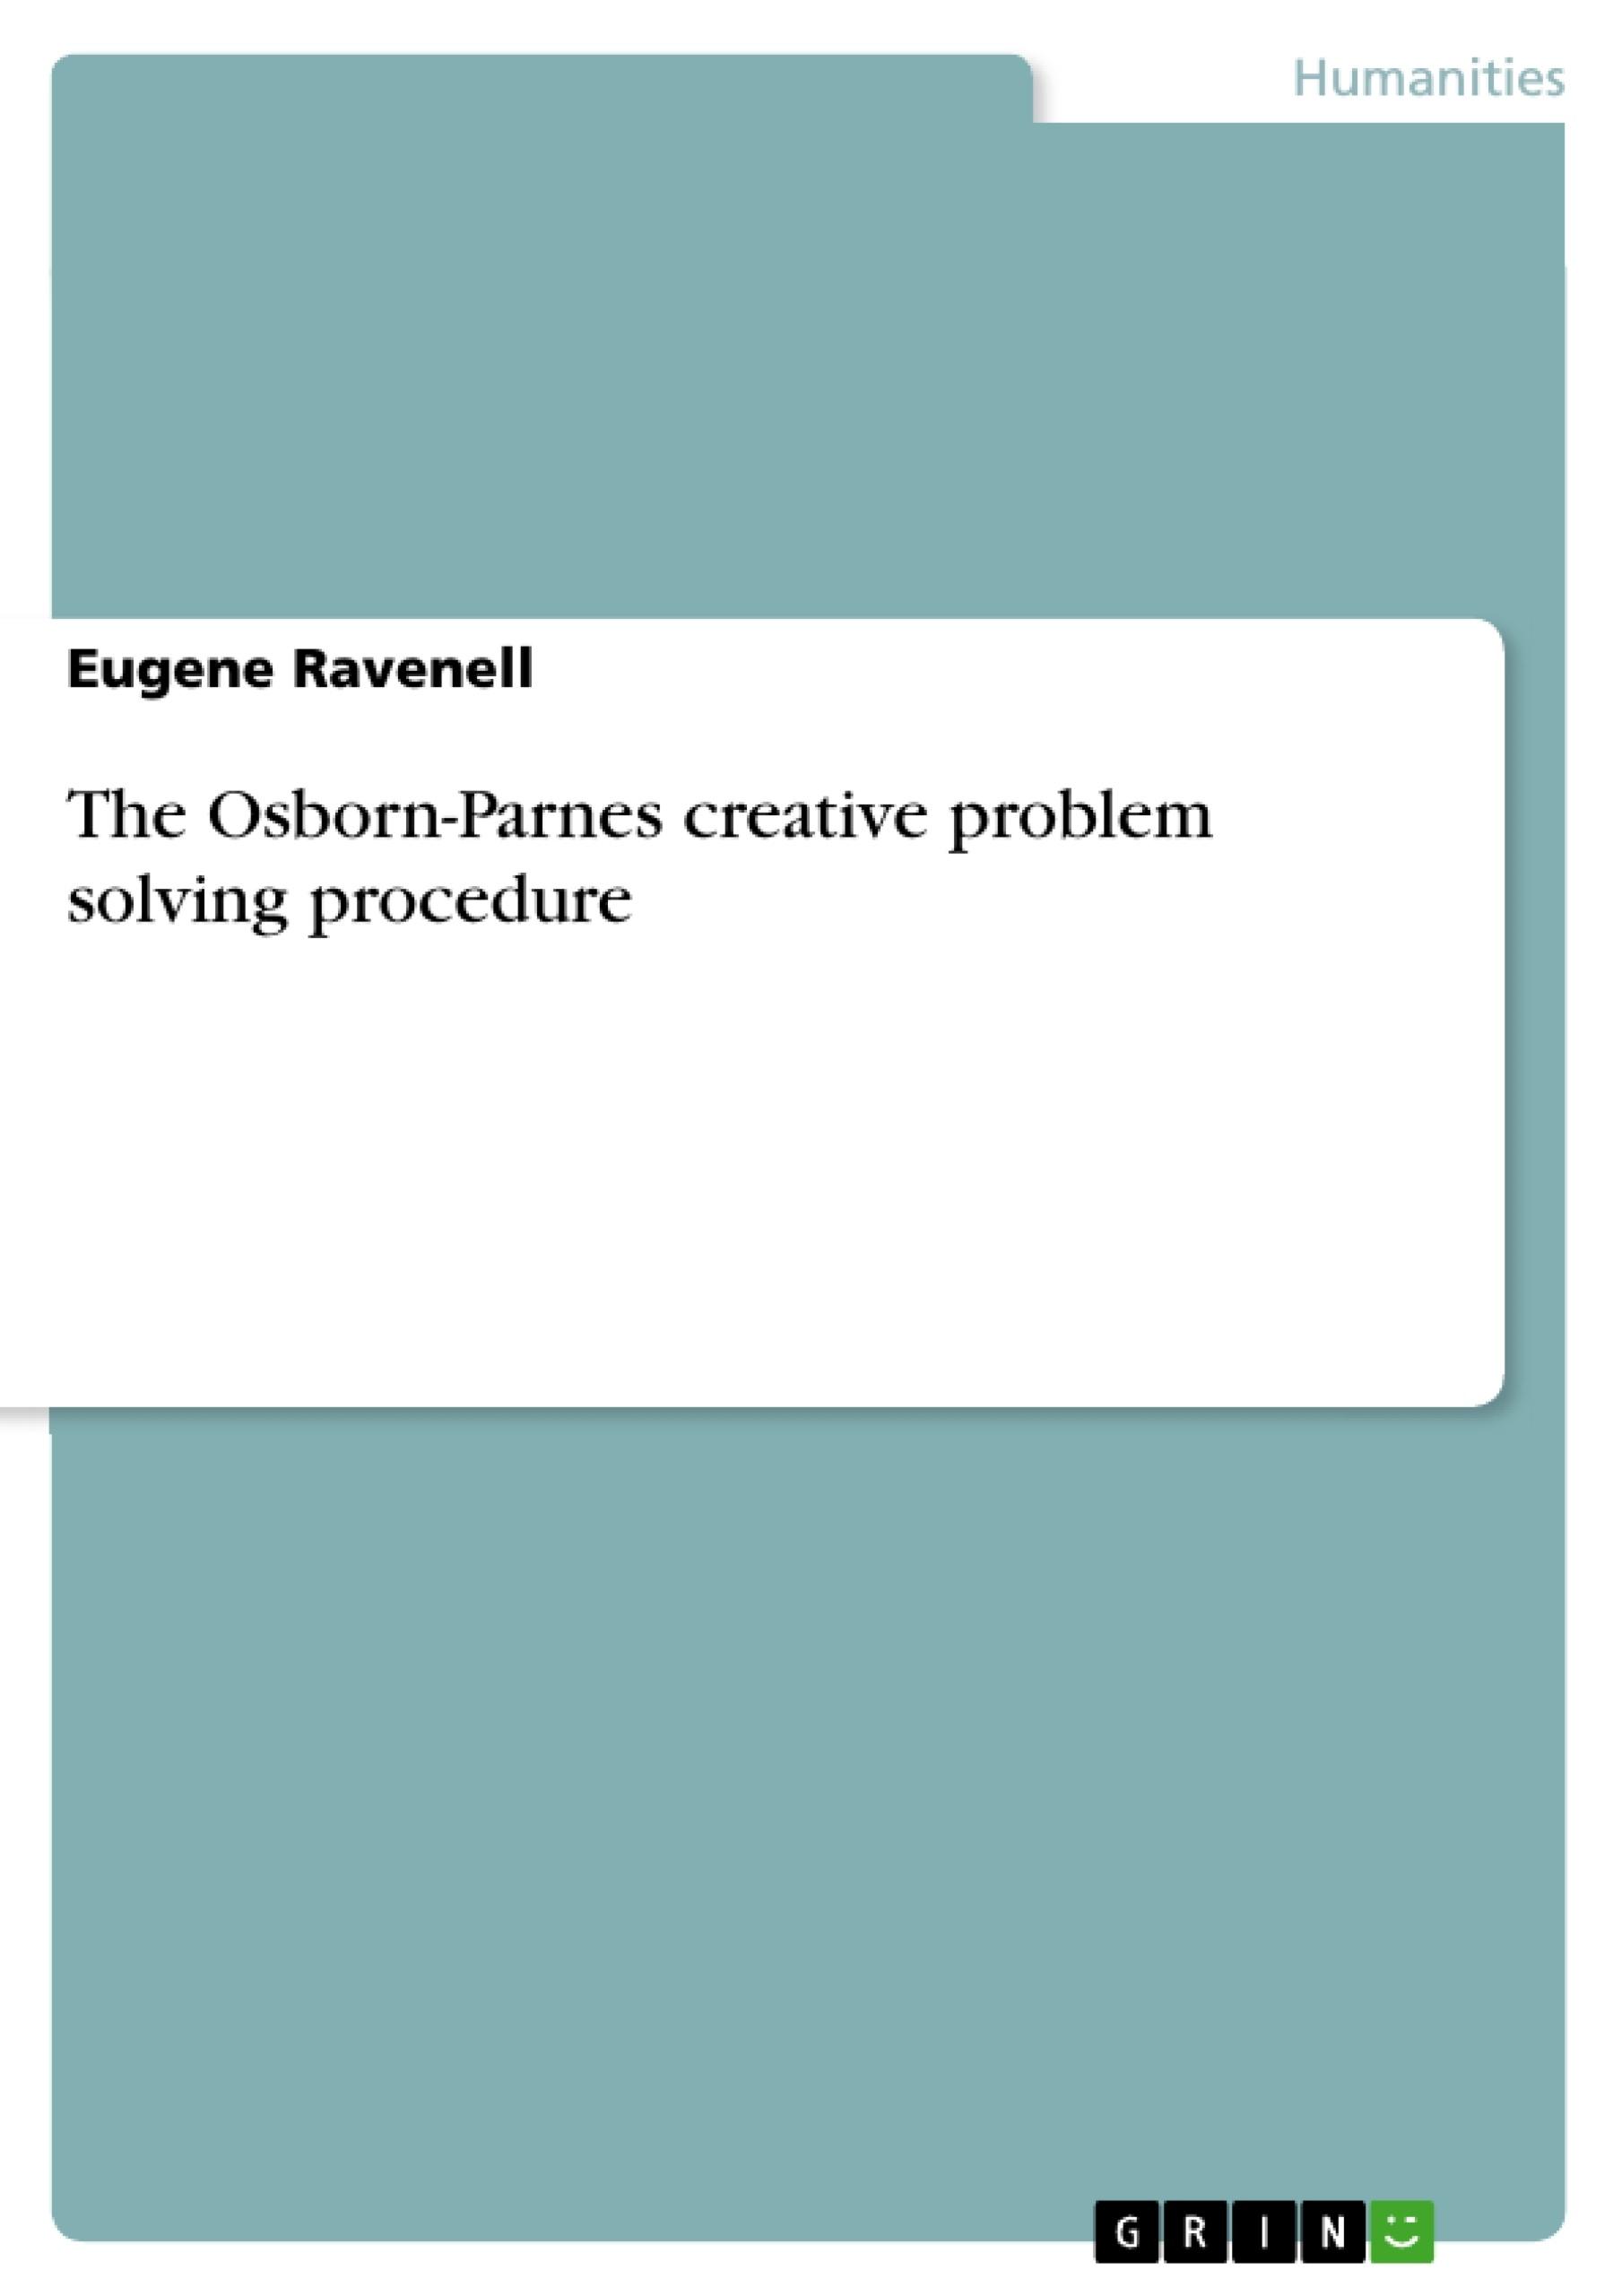 Title: The Osborn-Parnes creative problem solving procedure